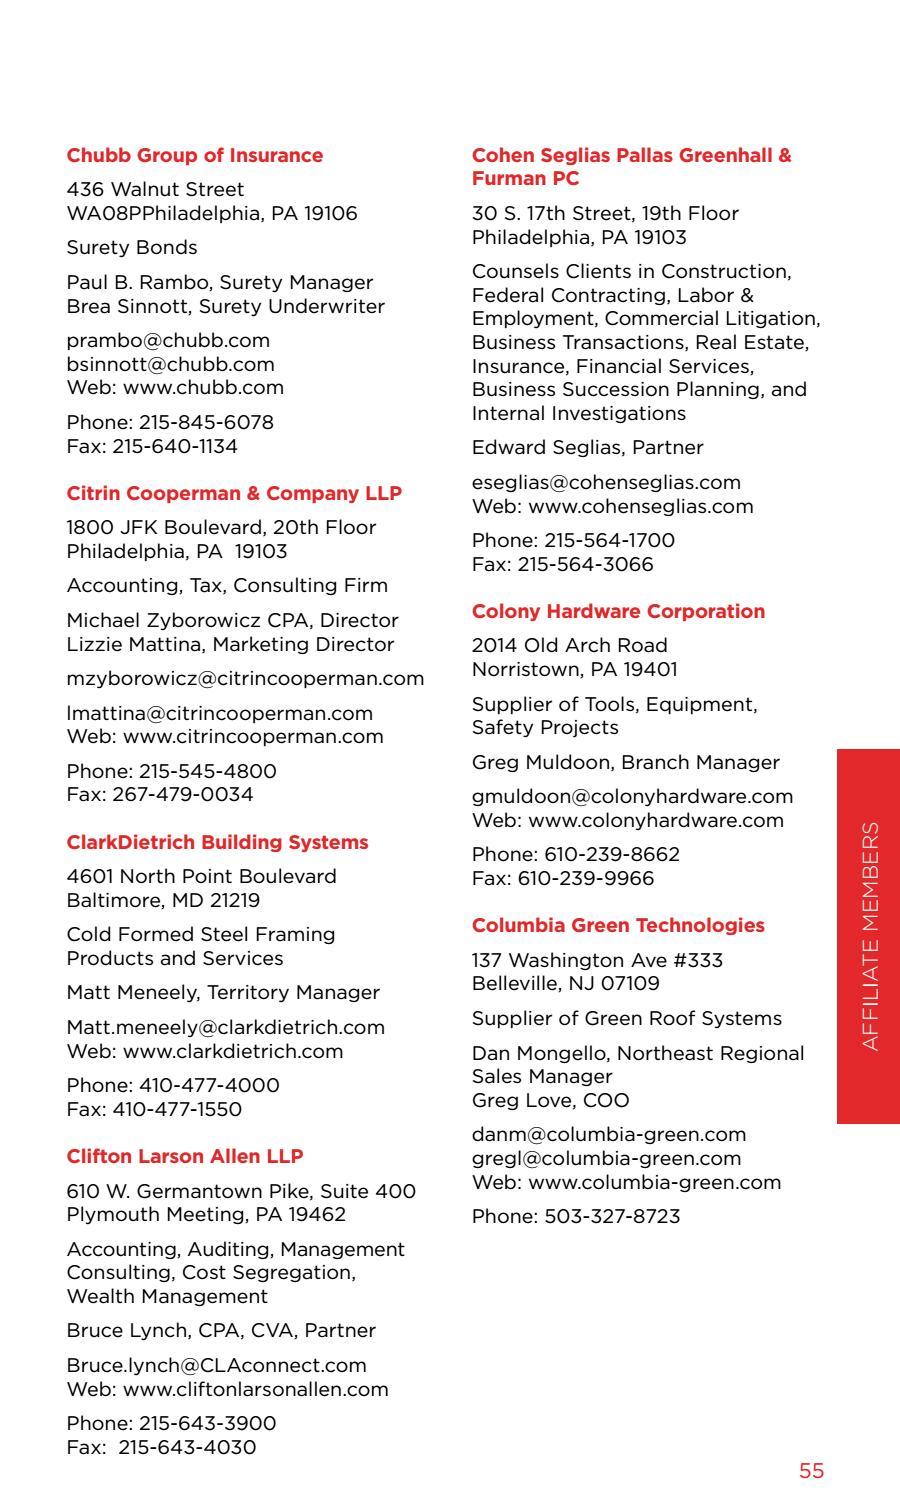 GBCA Membership Directory: 2017-2018 by General Building Contractors